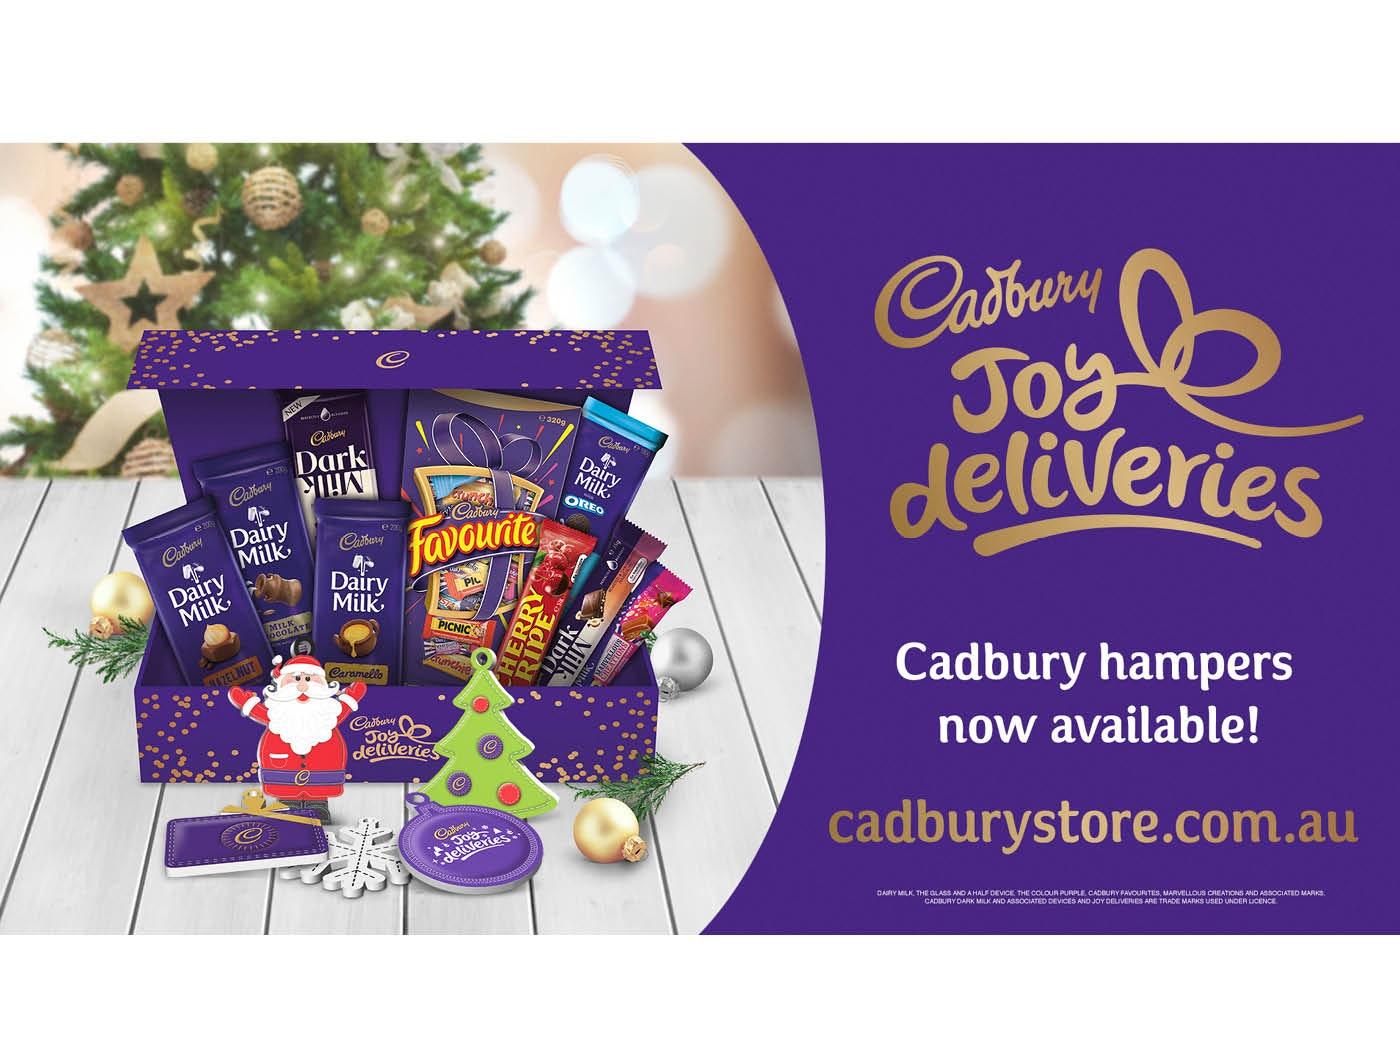 cadbury hampers sweepstakes